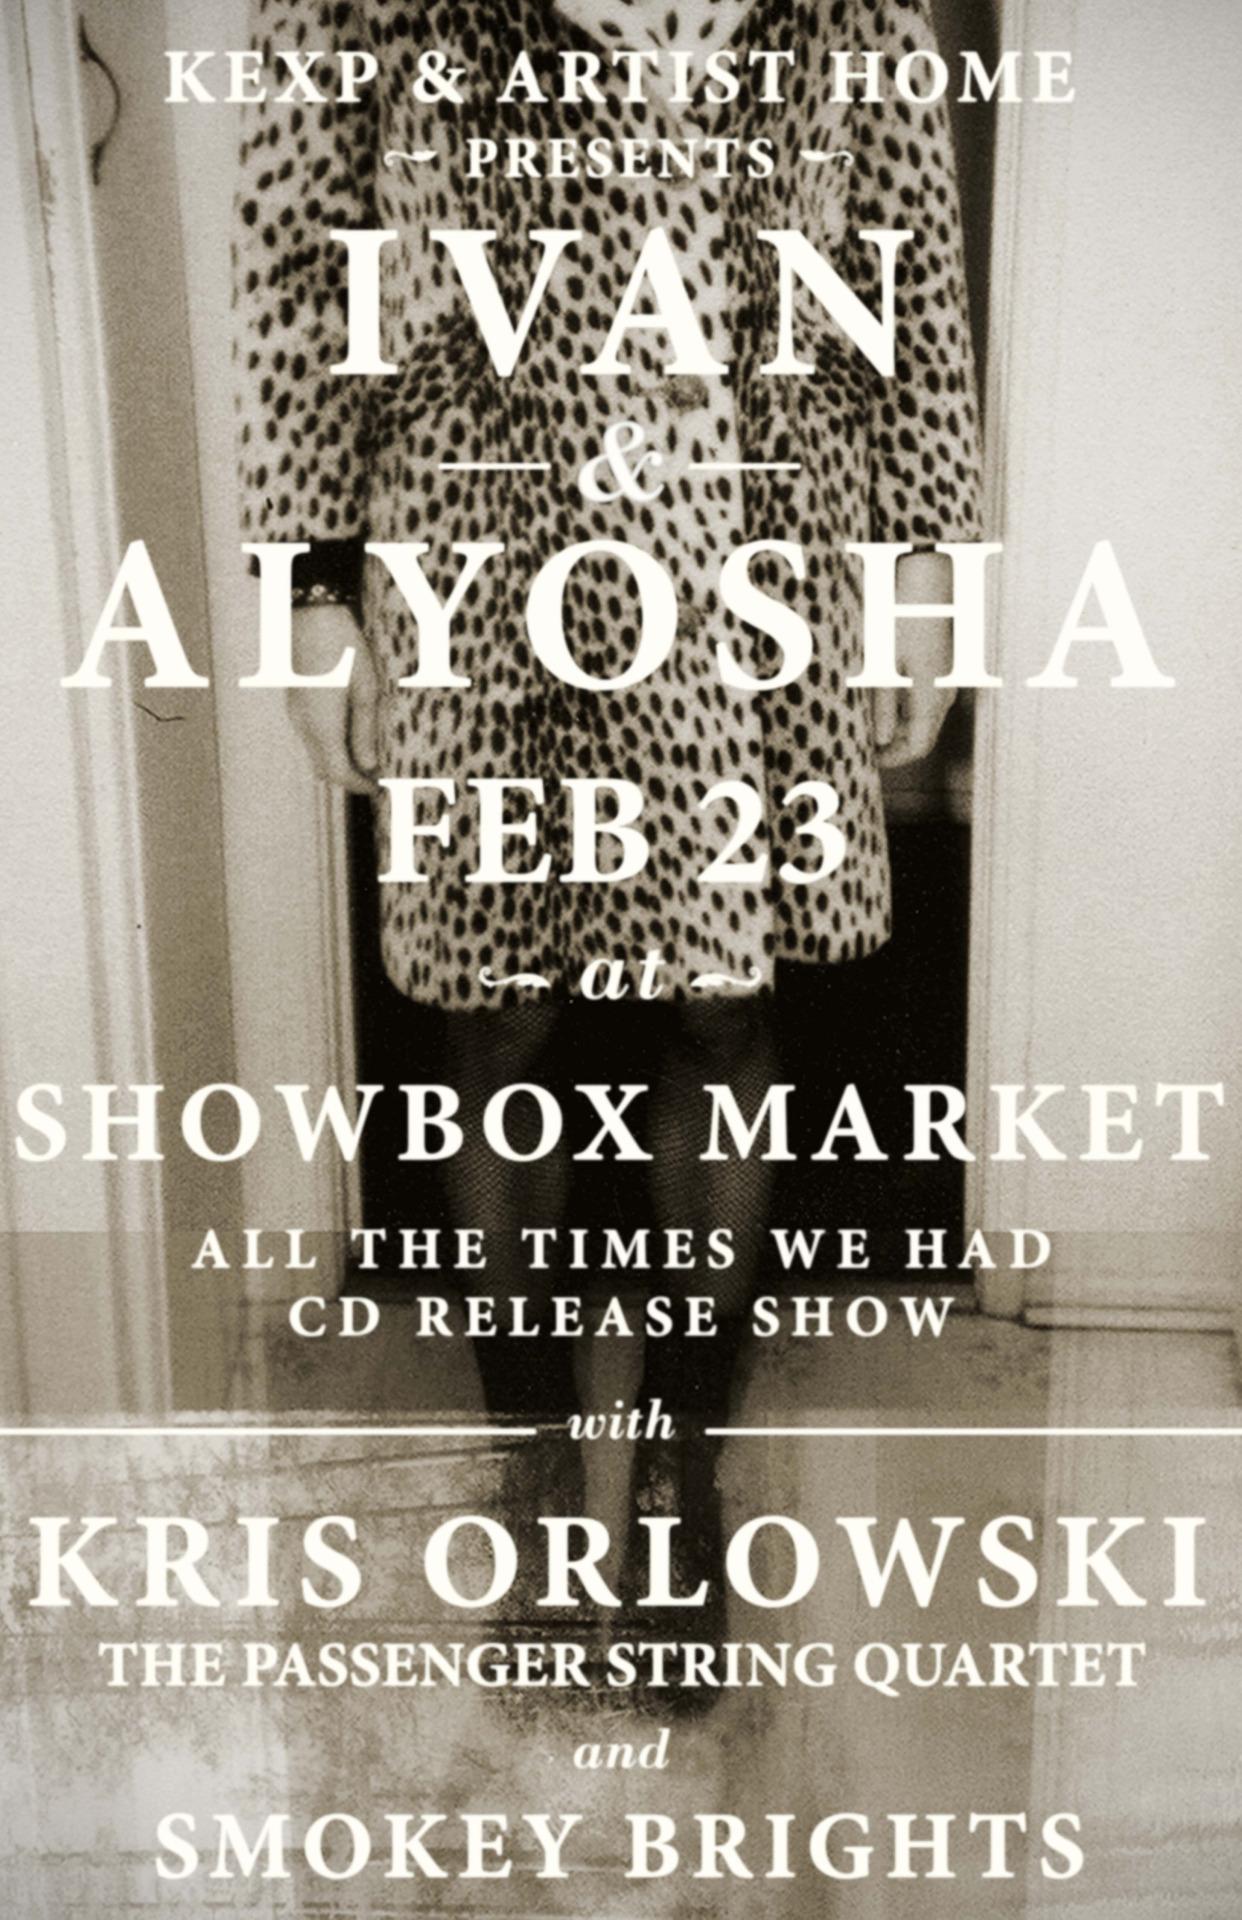 Only a few Tickets Left for Tomorrow's Showbox Show w/ Kris Orlowski / Smokey Brights / Passenger String Quartet! Get 'em here!  http://bit.ly/IvanAlyoshaShowbox